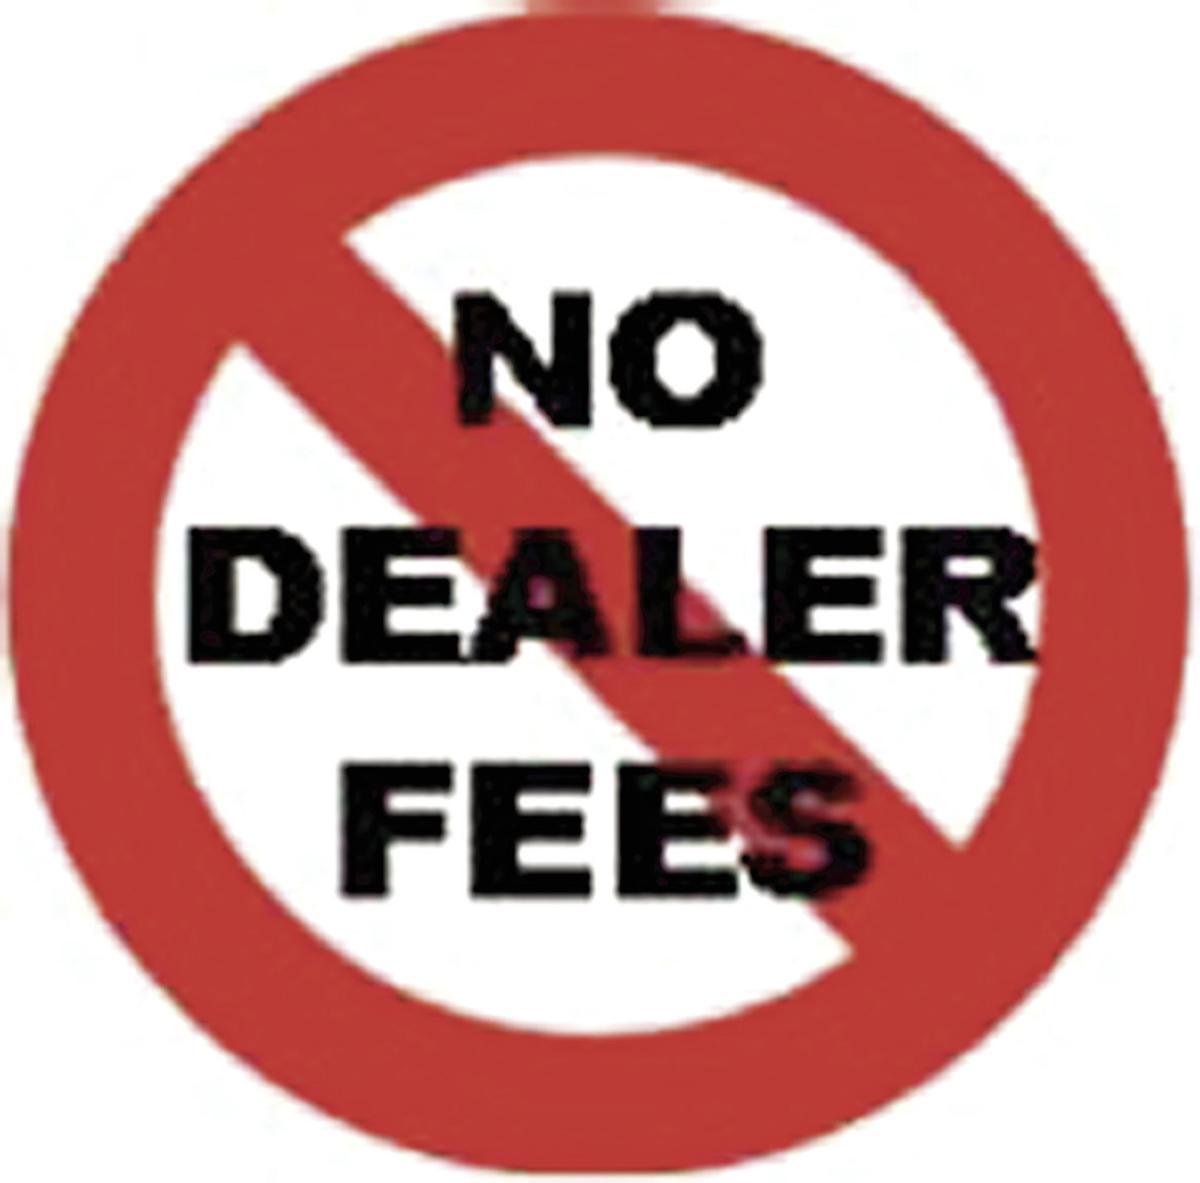 Car Dealers With No Dealer Fees >> The Car Dealers Dirty Little Secret Earl Stewart Hometownnewstc Com